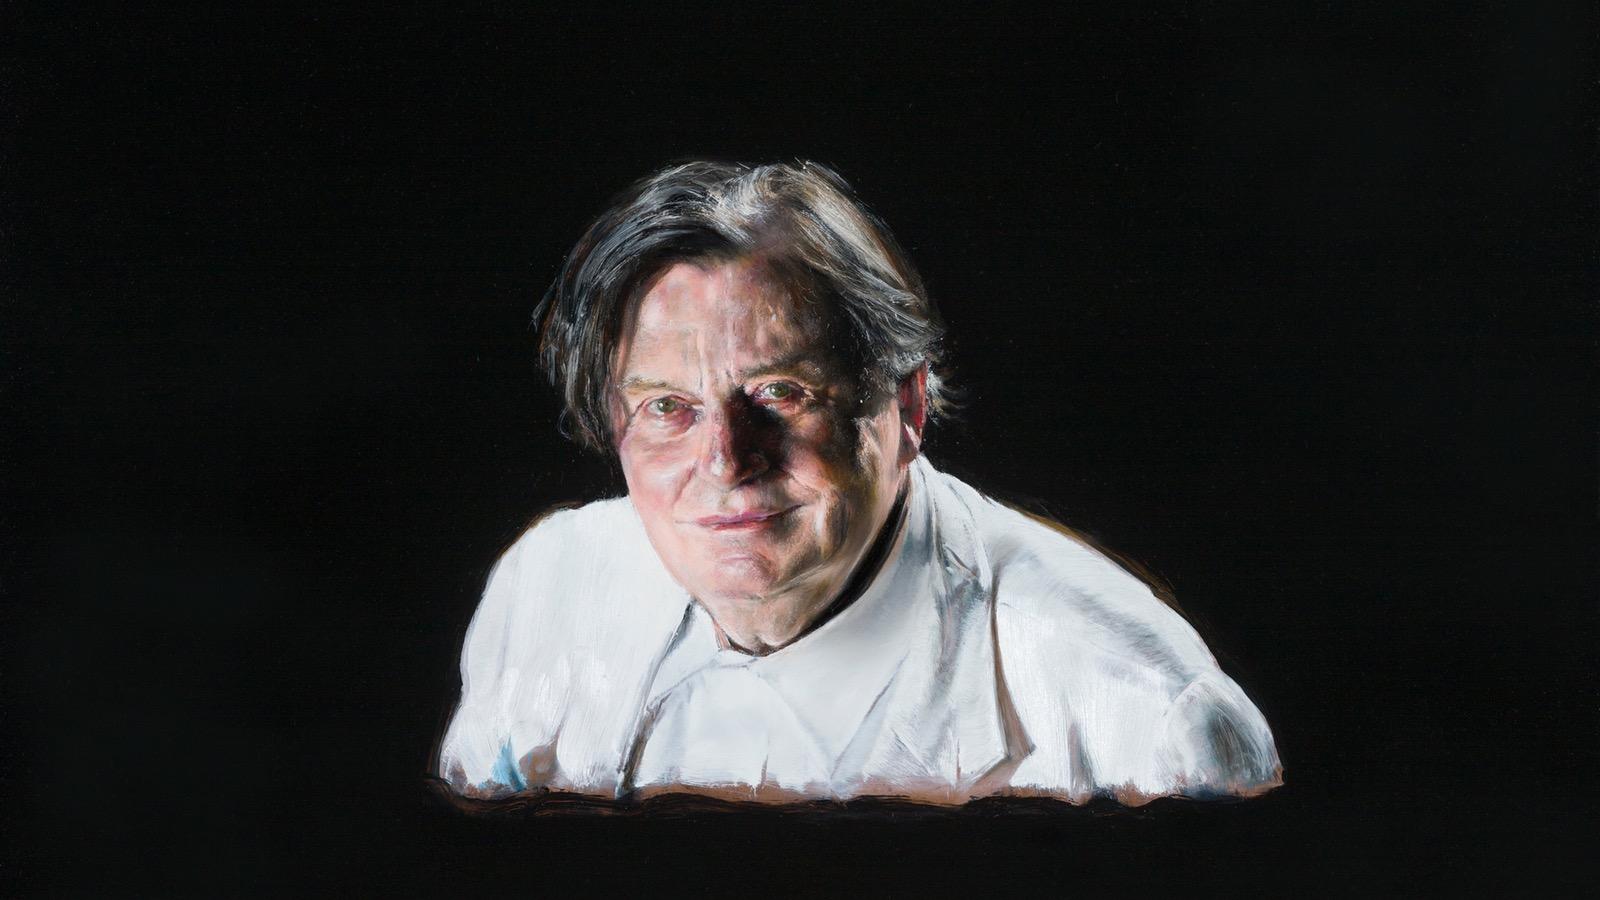 2016 Archibald Prize winner, Louise Hearman 'Barry' oil on masonite